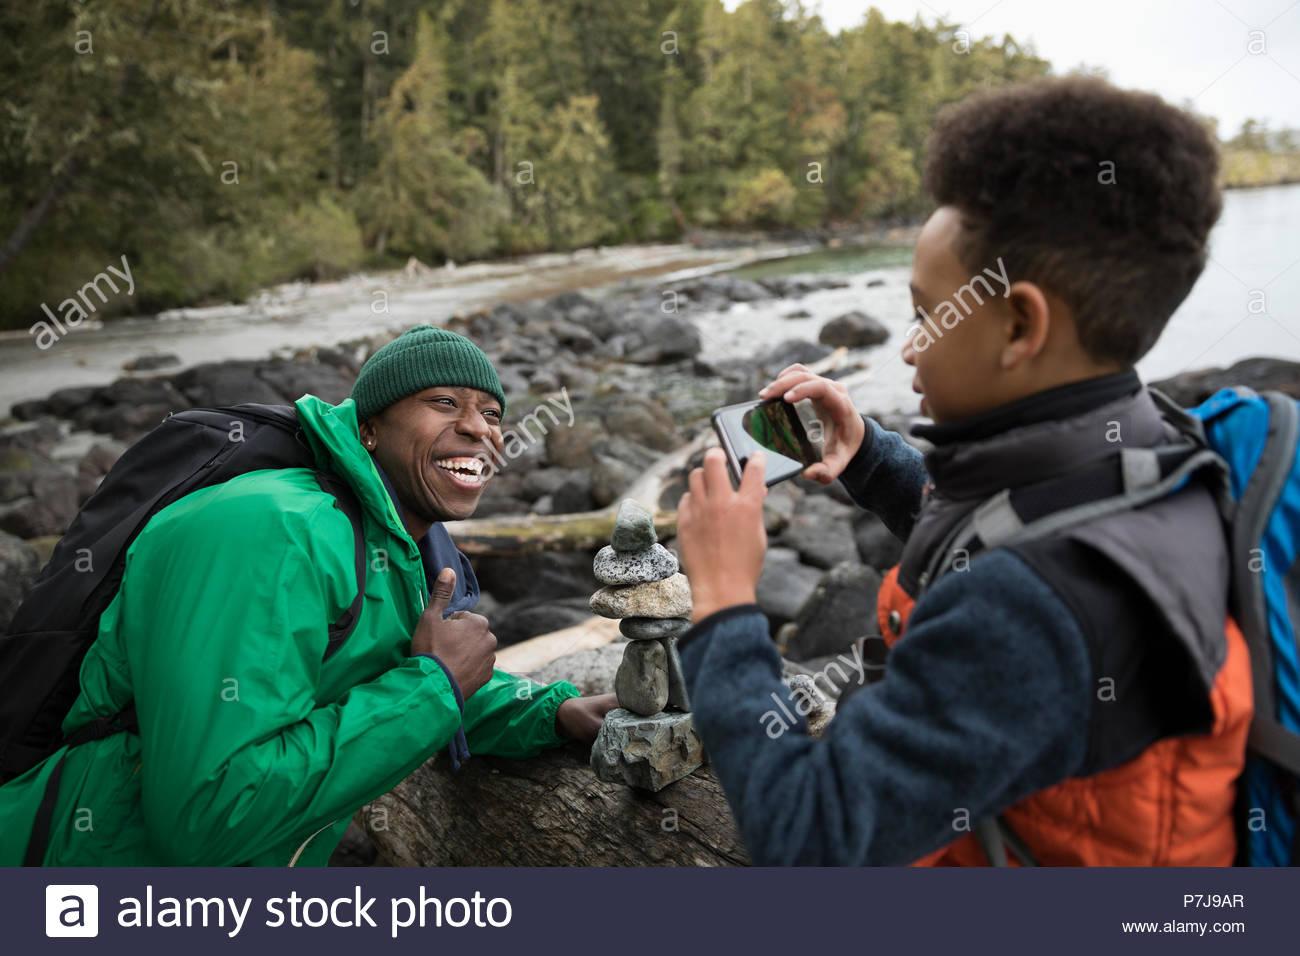 Hijo con cámara teléfono fotografiar juguetón padre en playa resistente Imagen De Stock